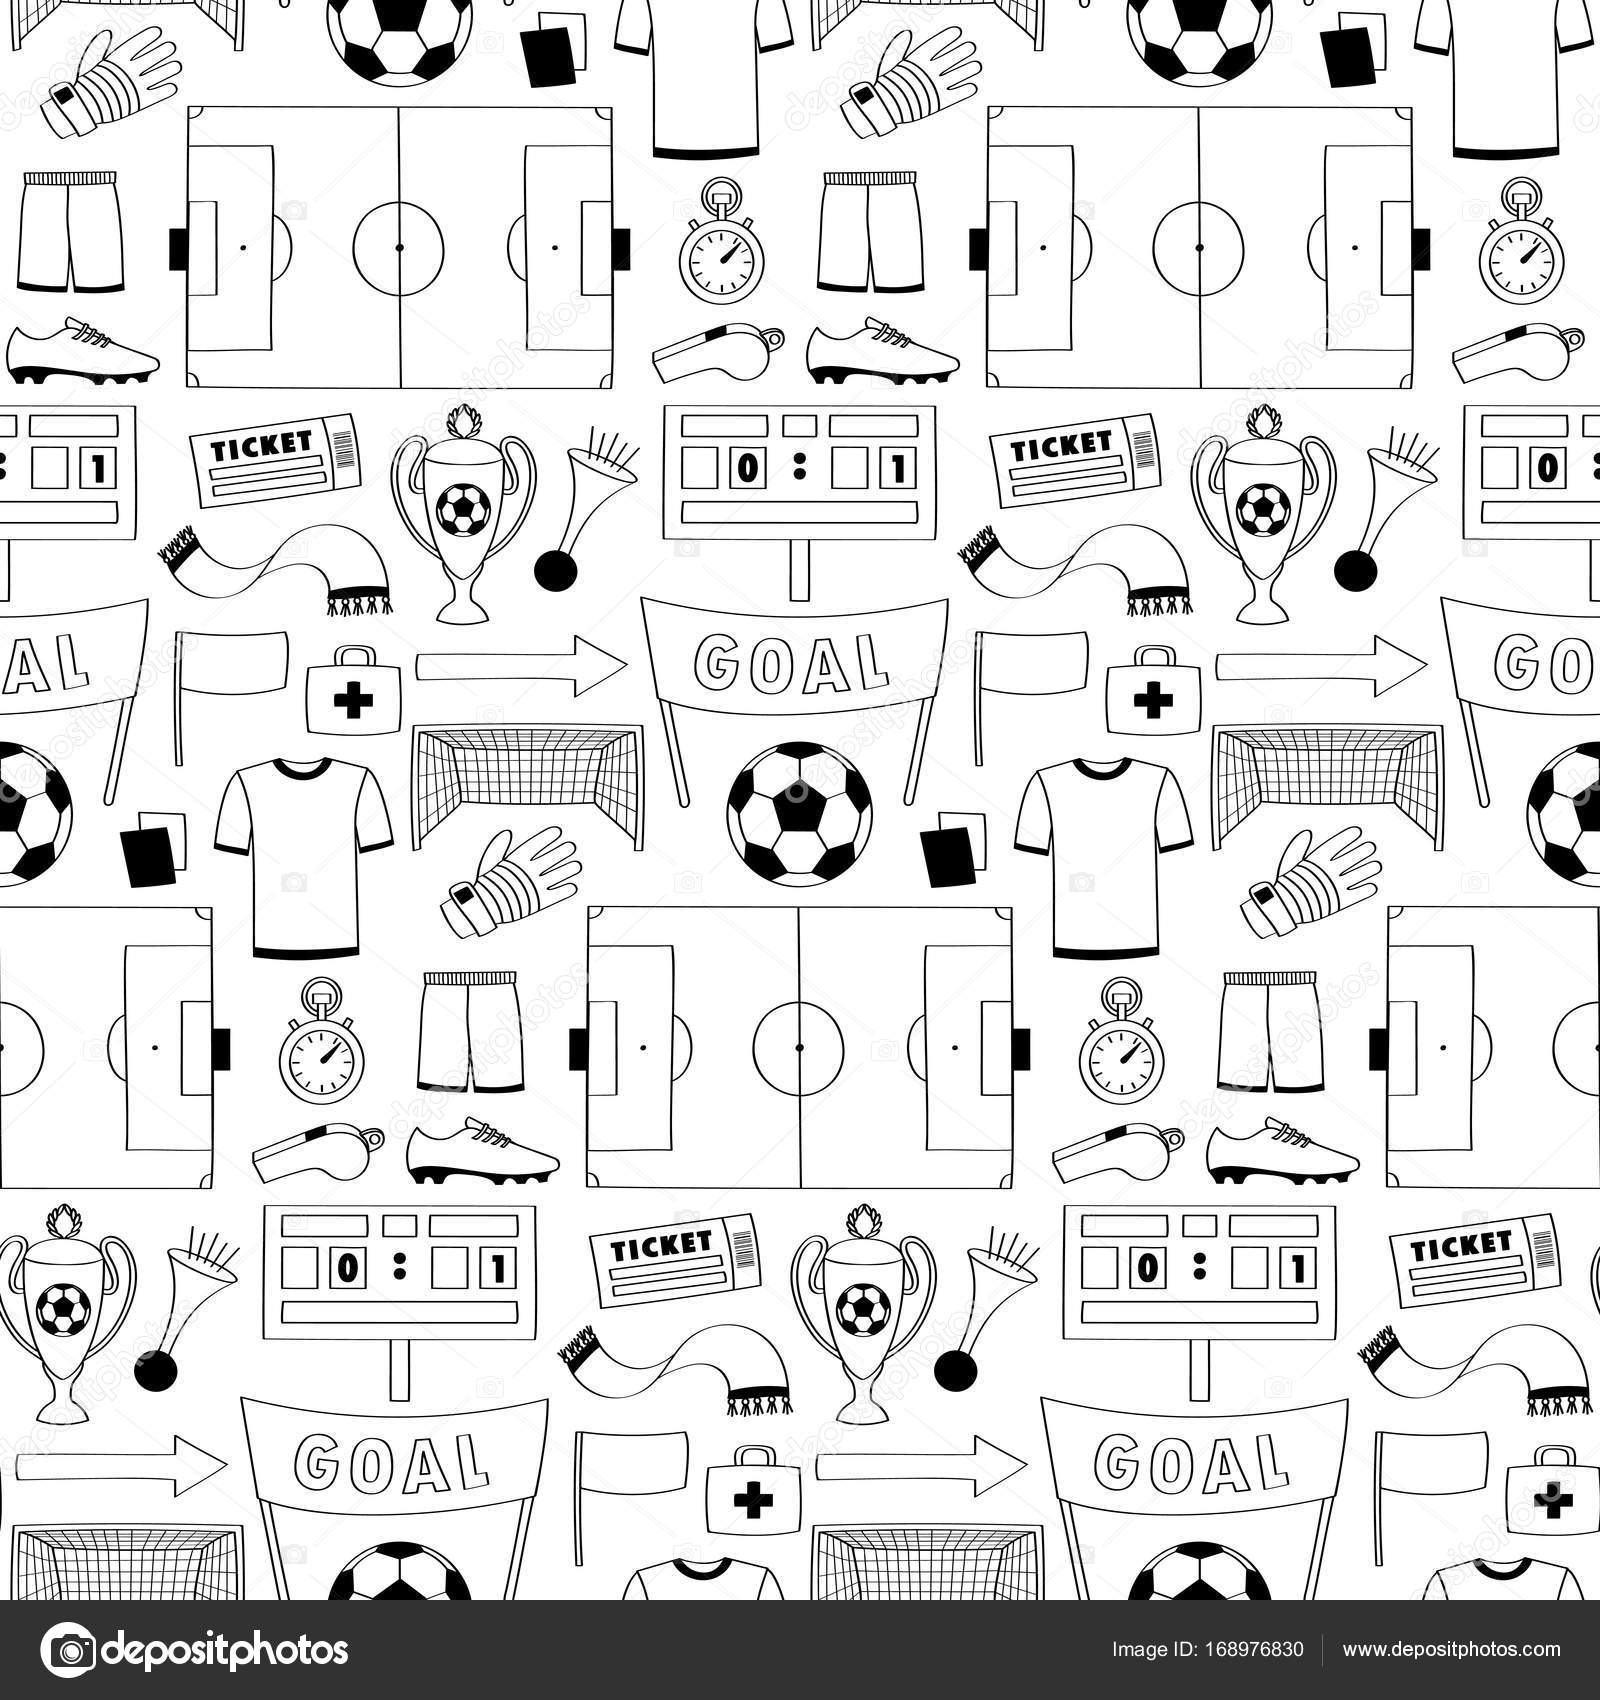 Fußball Dodle nahtlose Muster — Stockvektor © KronaLux #168976830